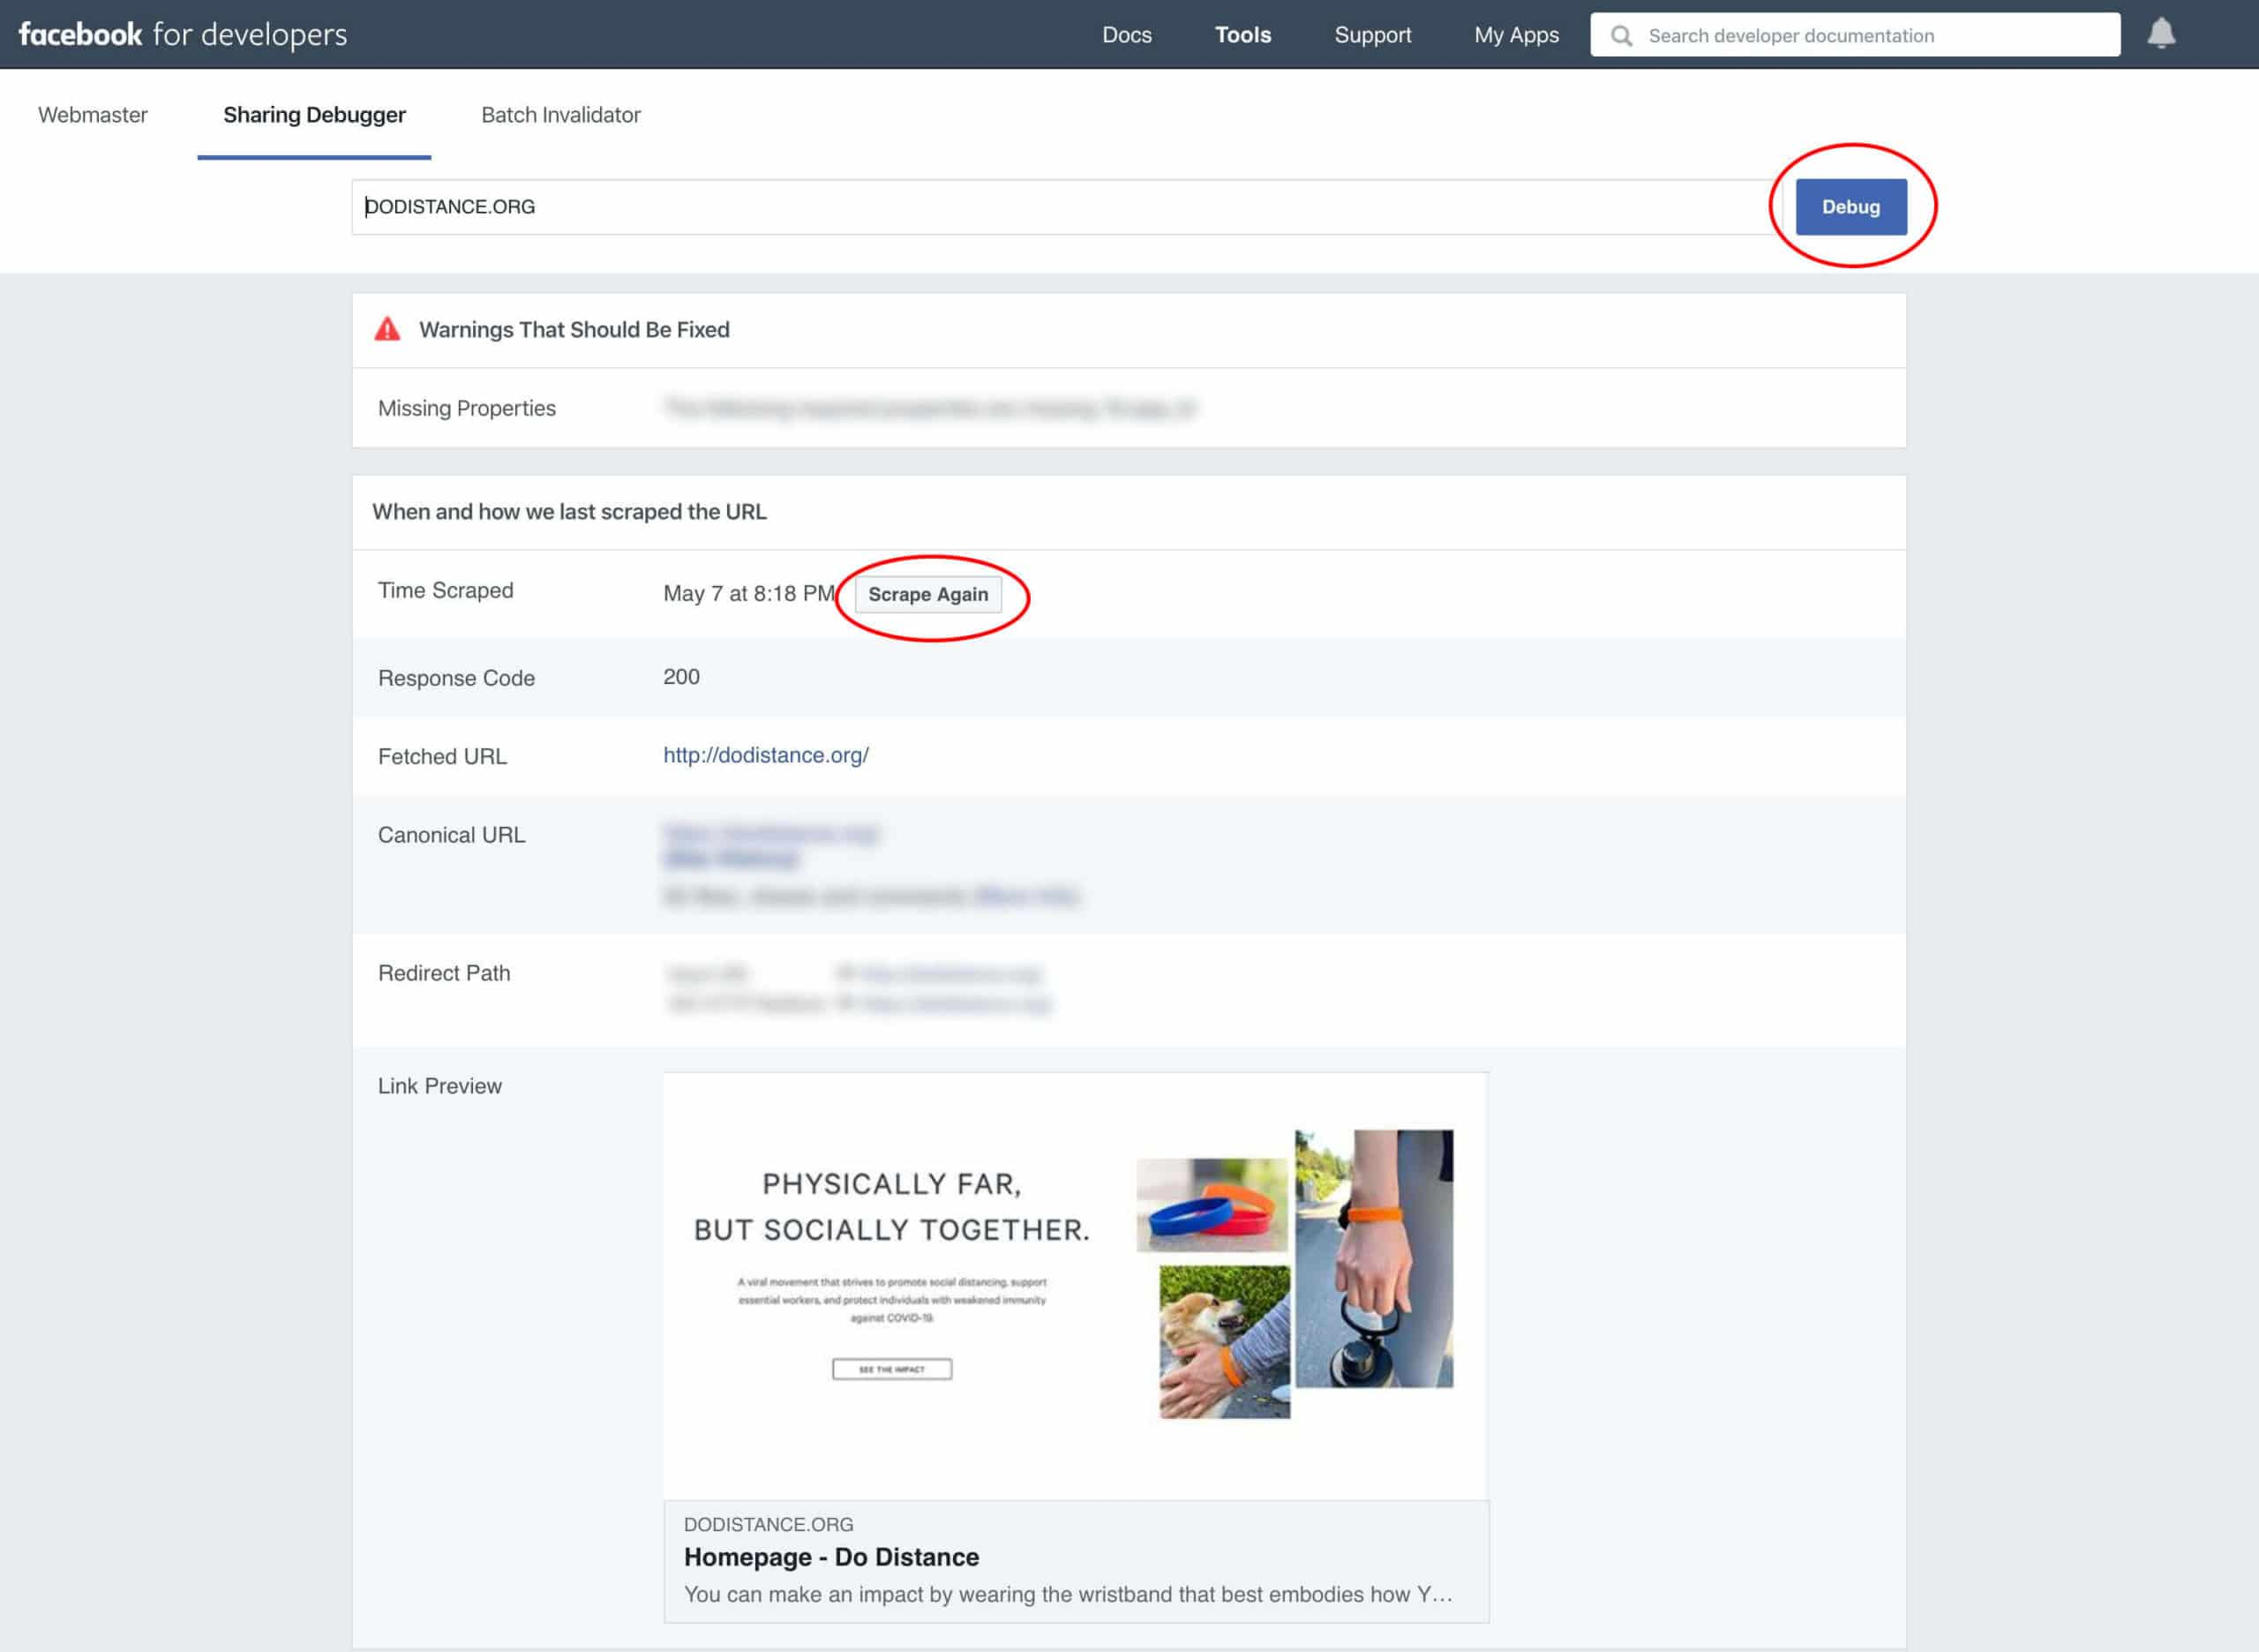 How to debug Facebook social image